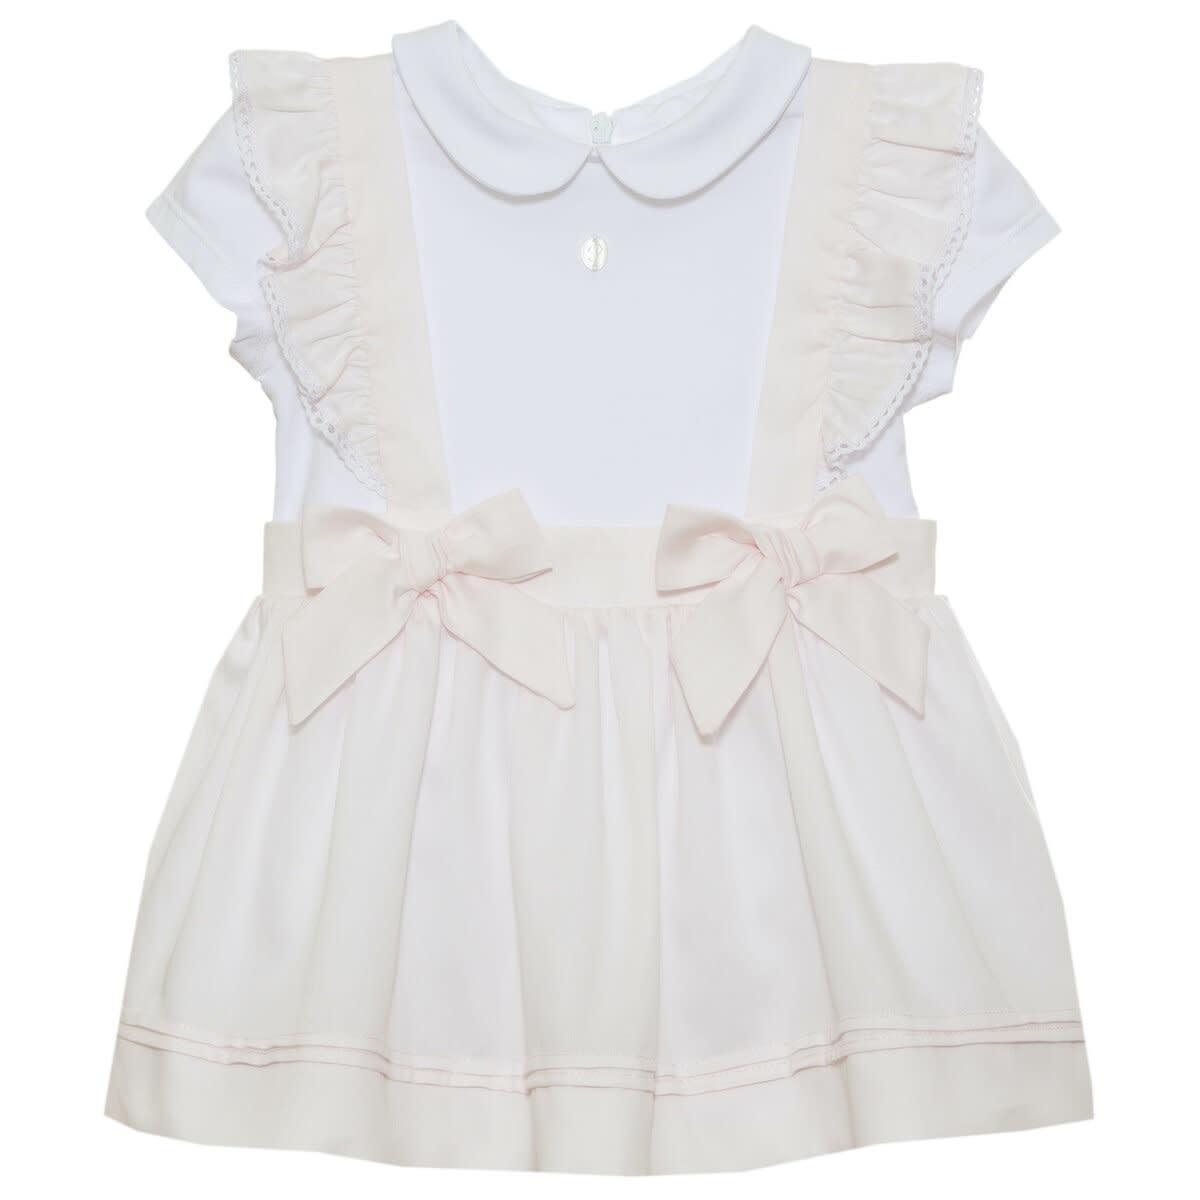 Patachou Patachou Dungaree Dress 3206 S21